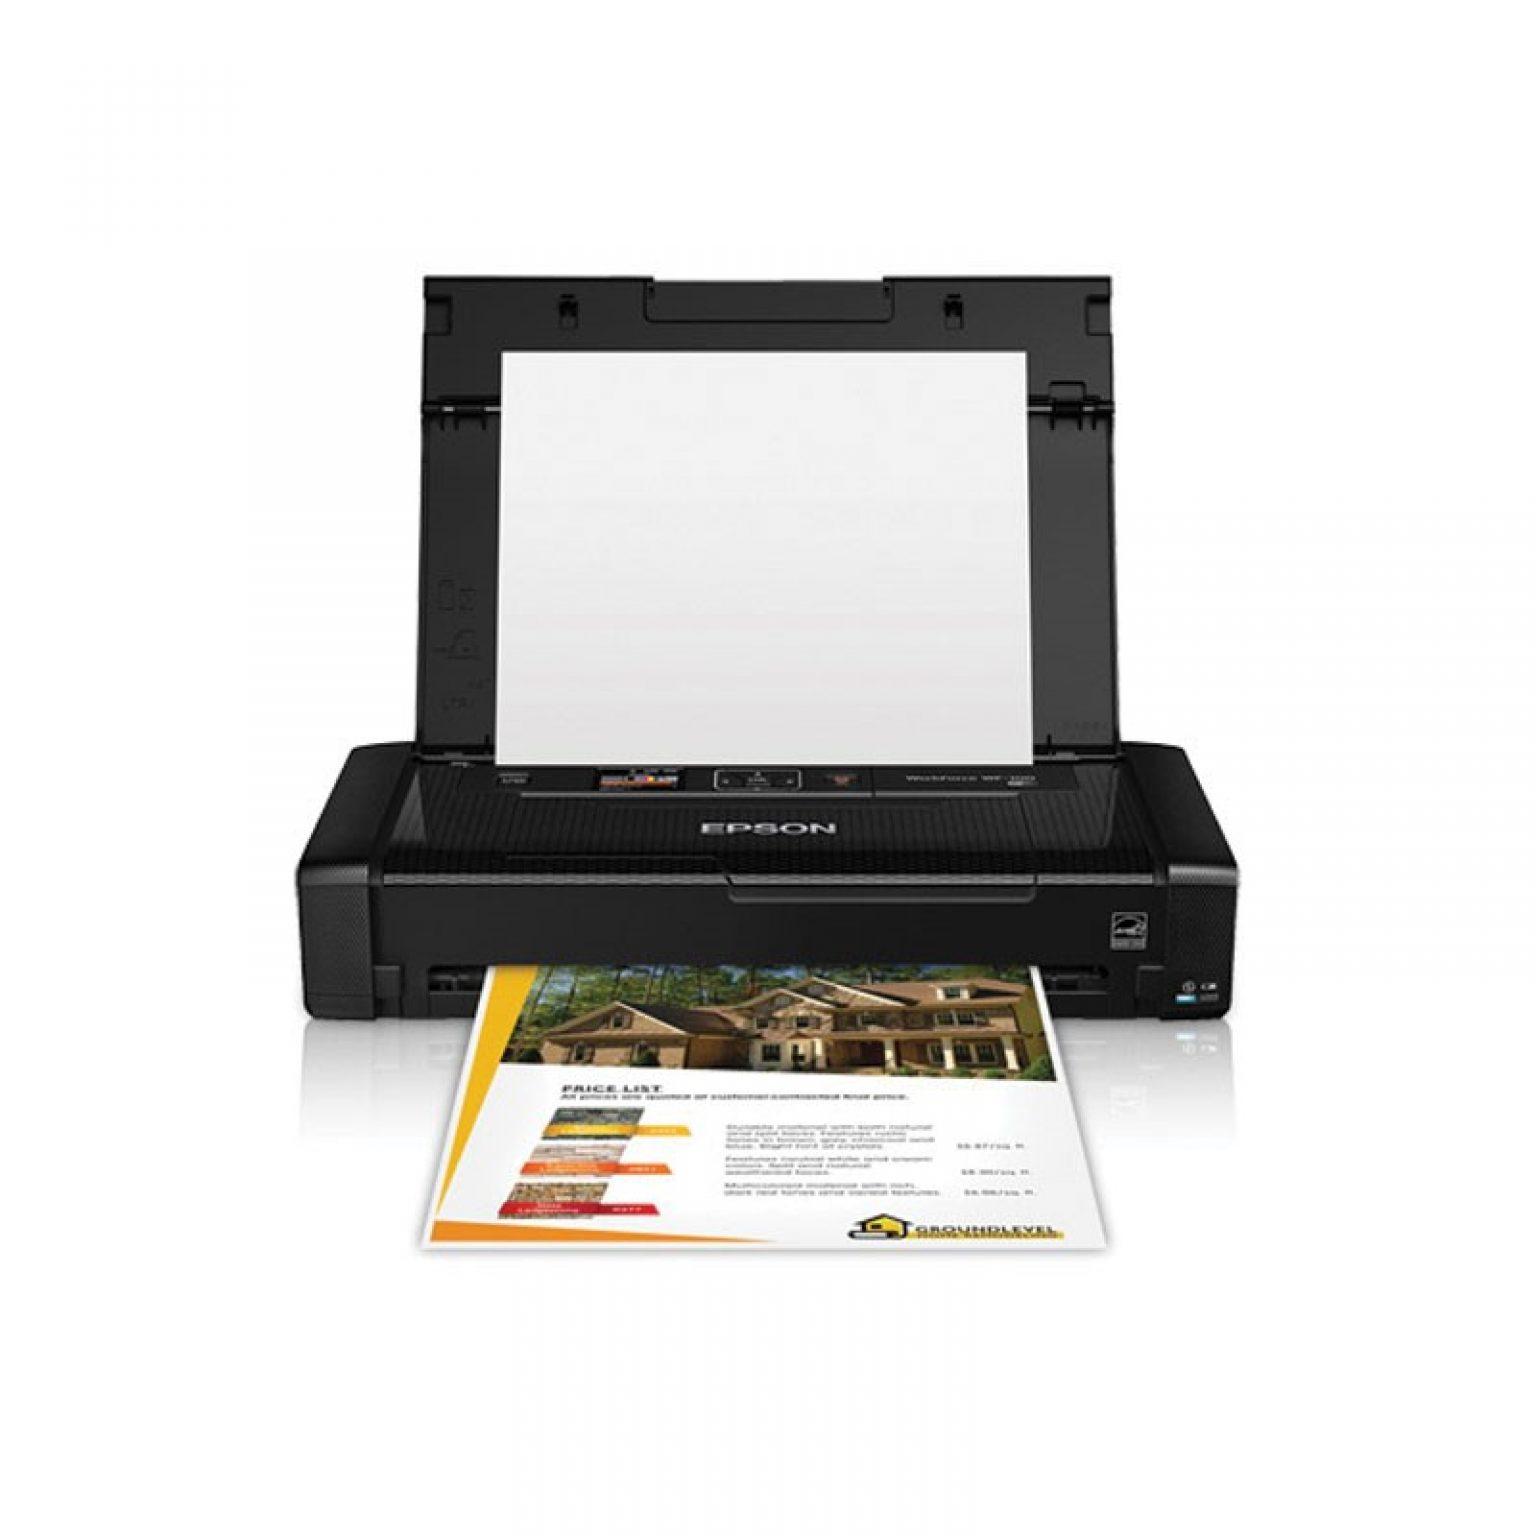 EPSON - WF 100 Inkjet Printer